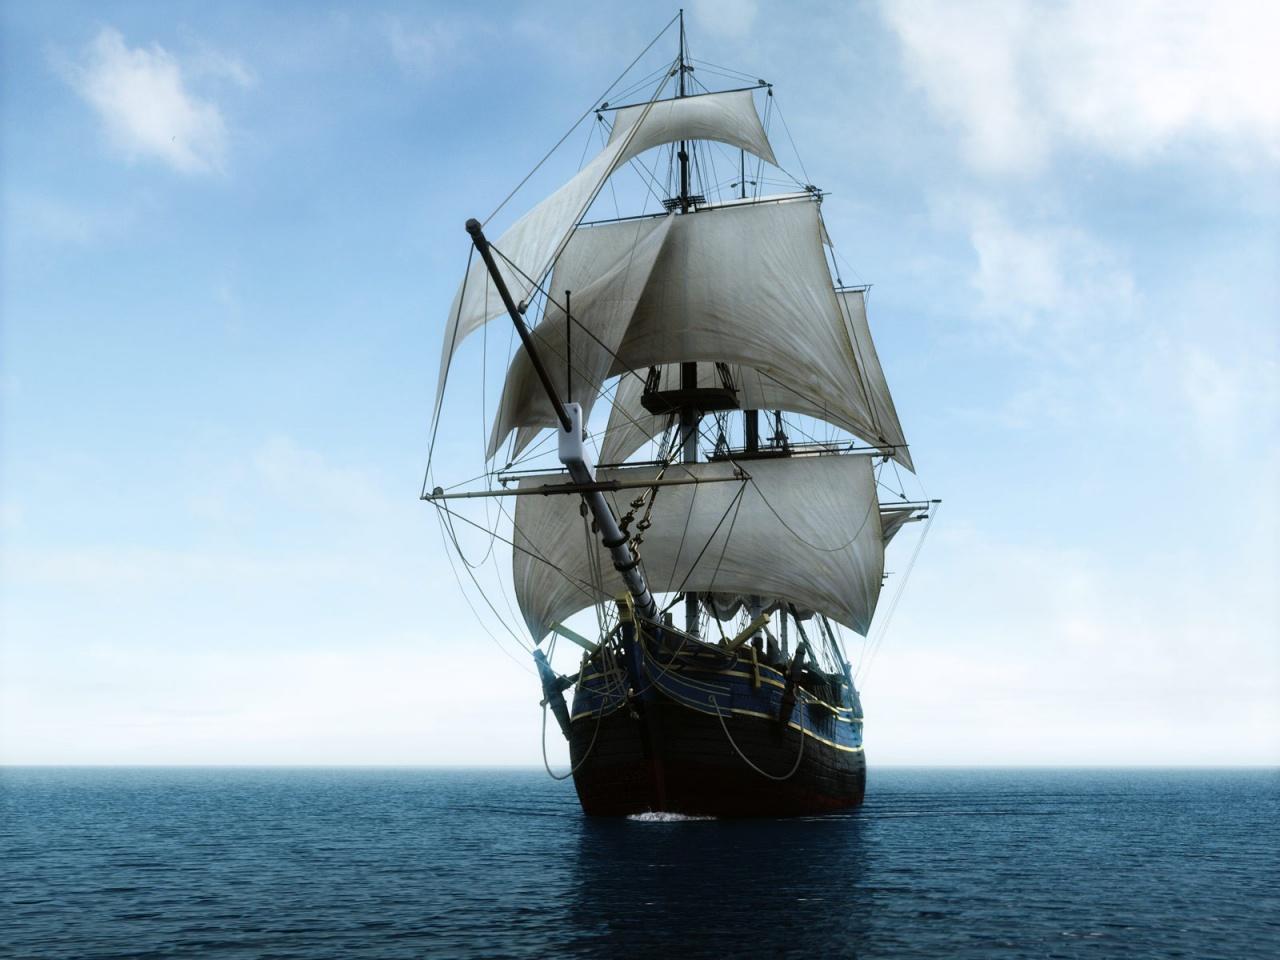 Pirate Ship Wallpaper 1280x960 pixel Popular HD Wallpaper 3318 1280x960